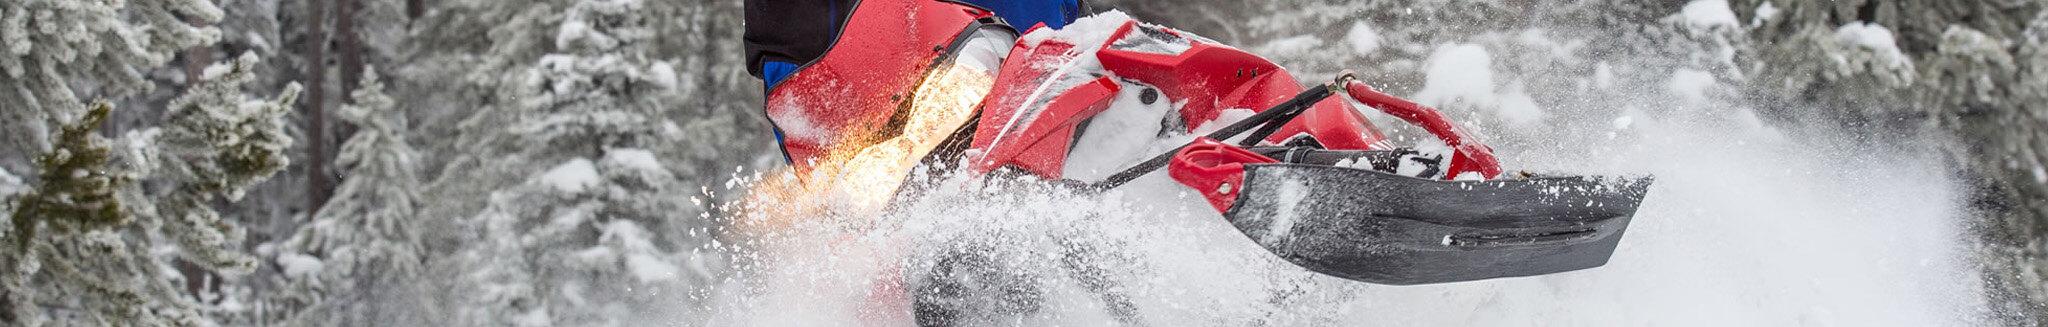 YAMAHA SNOWMOBILE DEALER IN PEACE RIVER AB | MAXIMUM POWERSPORTS